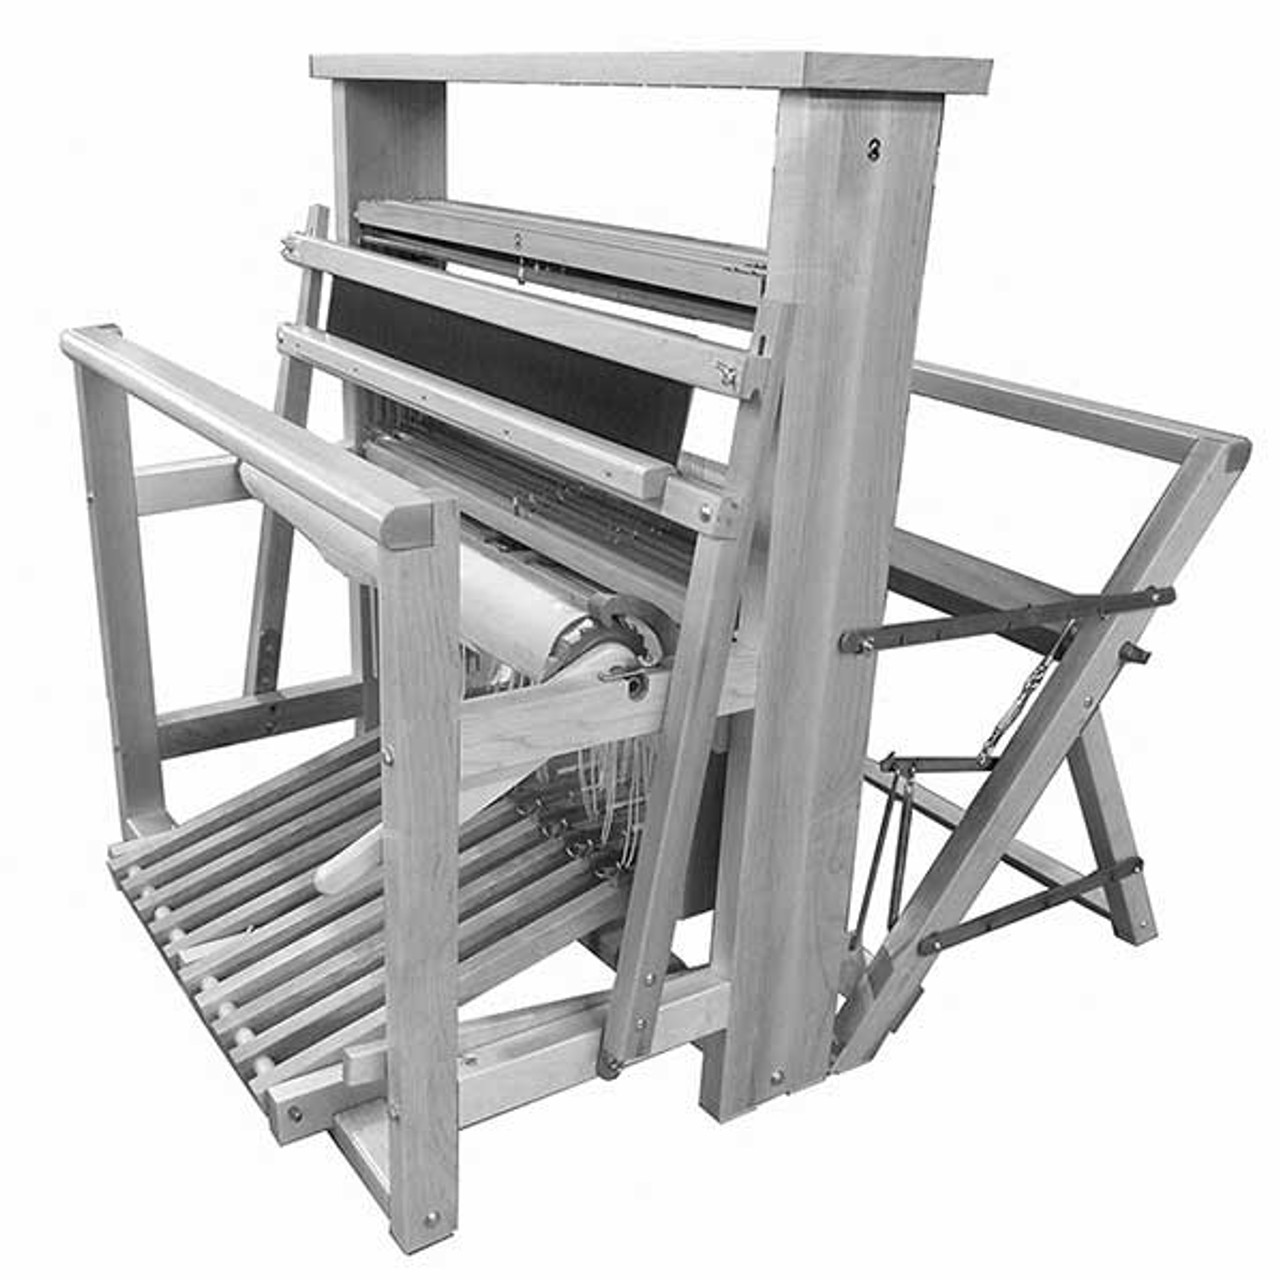 Leclerc Nilus II Jack Loom 4 Harness Floor Loom | The Woolery